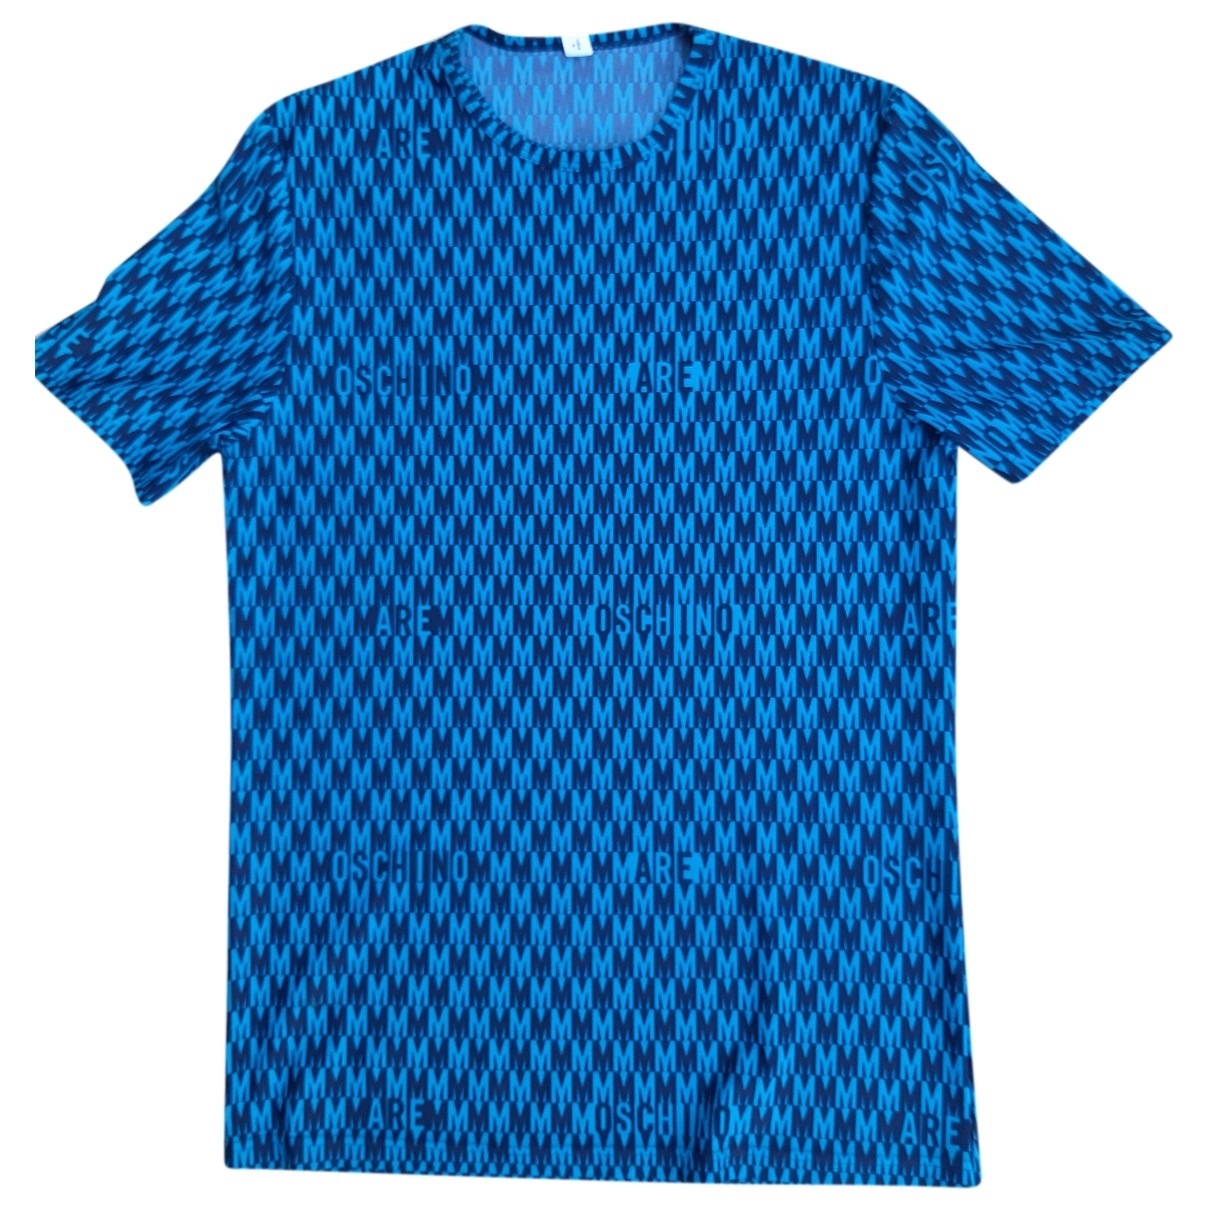 Moschino - Tee shirts   pour homme - bleu